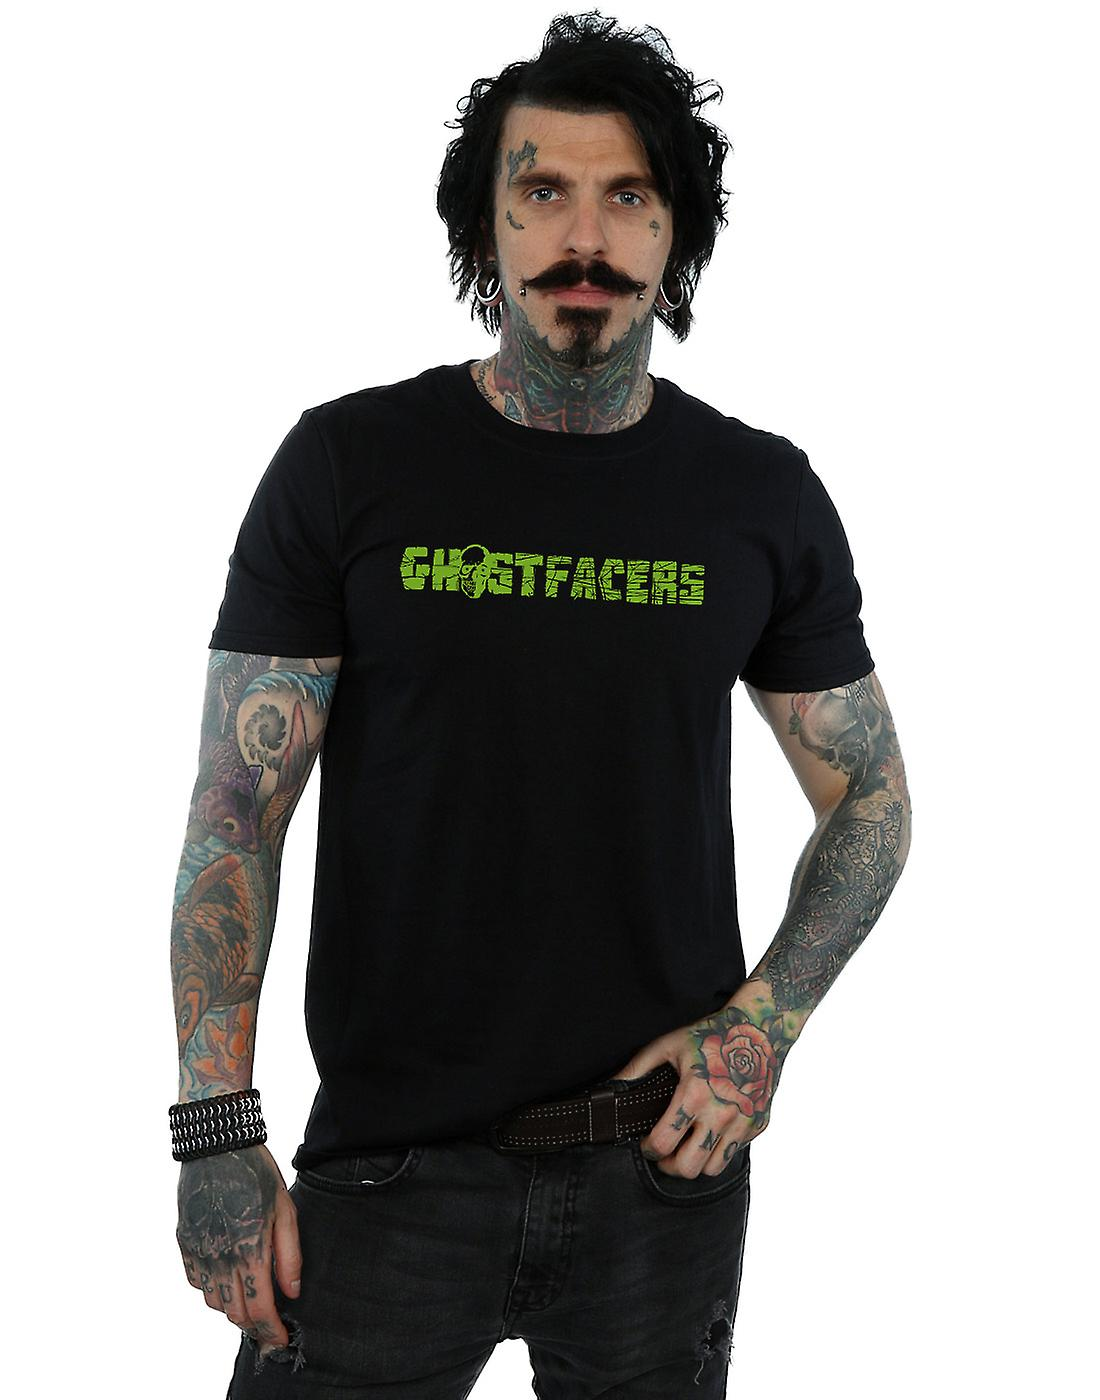 Supernatural Men's Ghostfacers Logo T-Shirt